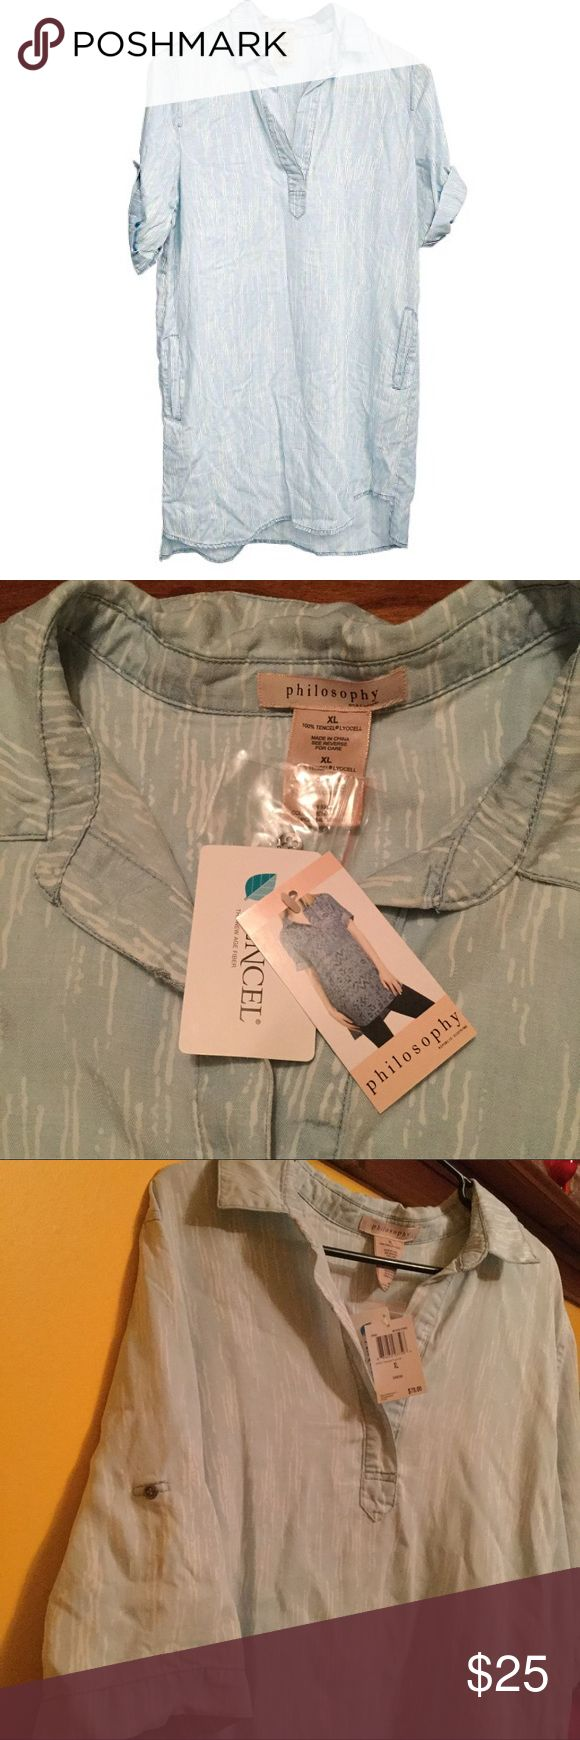 Philosophy Dress XL Meteor Stripe New with tags Philosophy shirt dress XL New with tags retail $78. Philosophy Dresses Midi